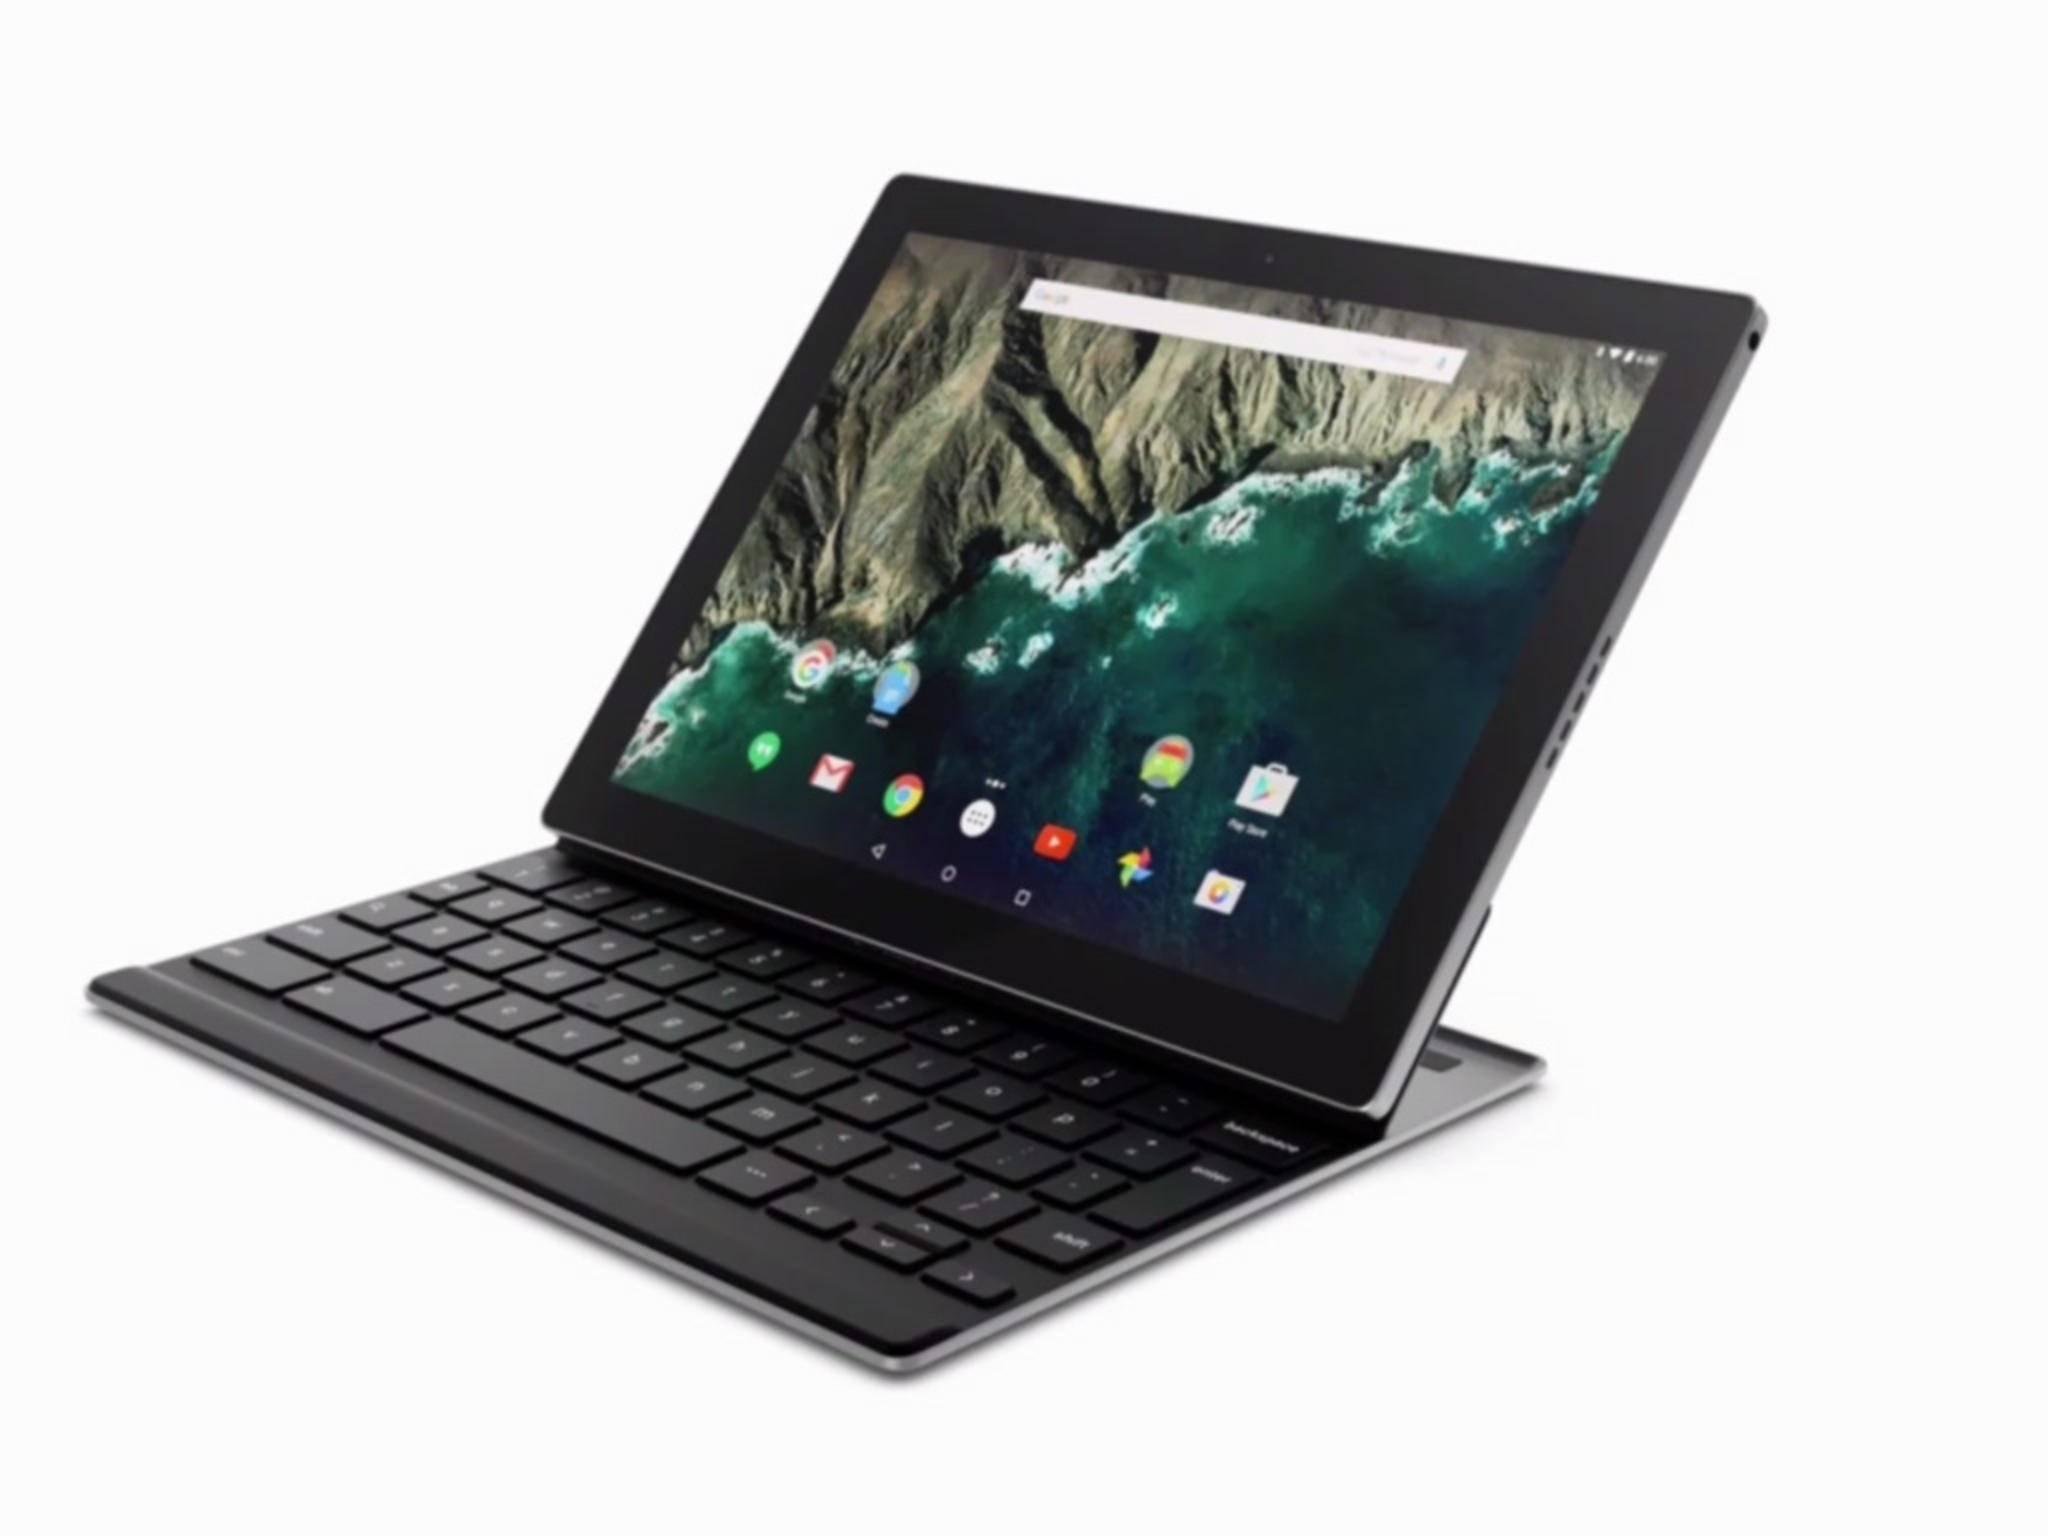 Das Pixel C: Googles neues Tablet mit Android 6.